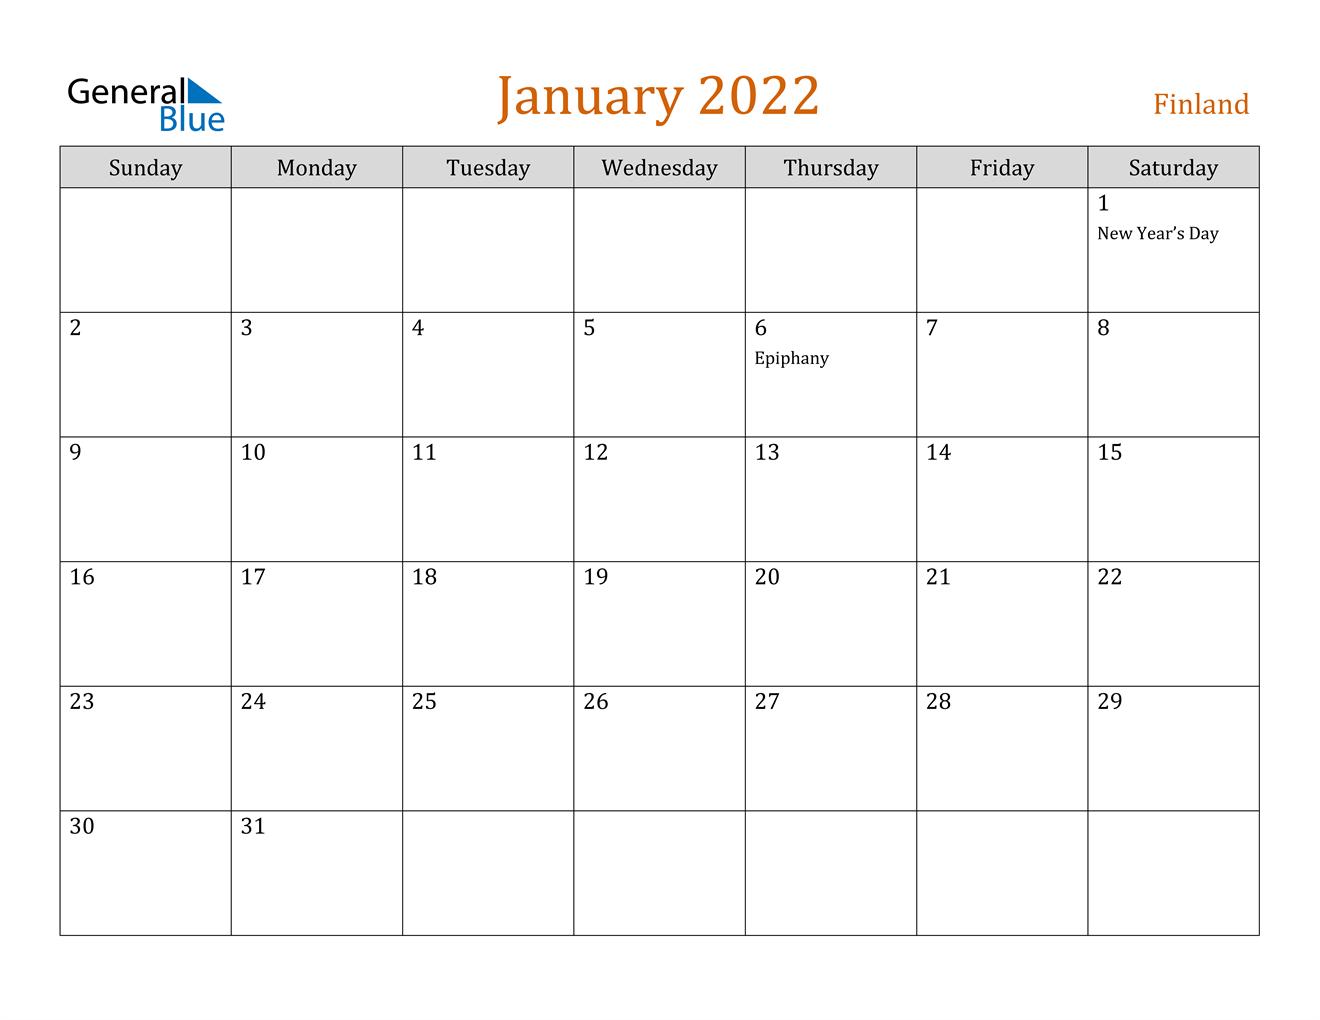 January 2022 Calendar - Finland